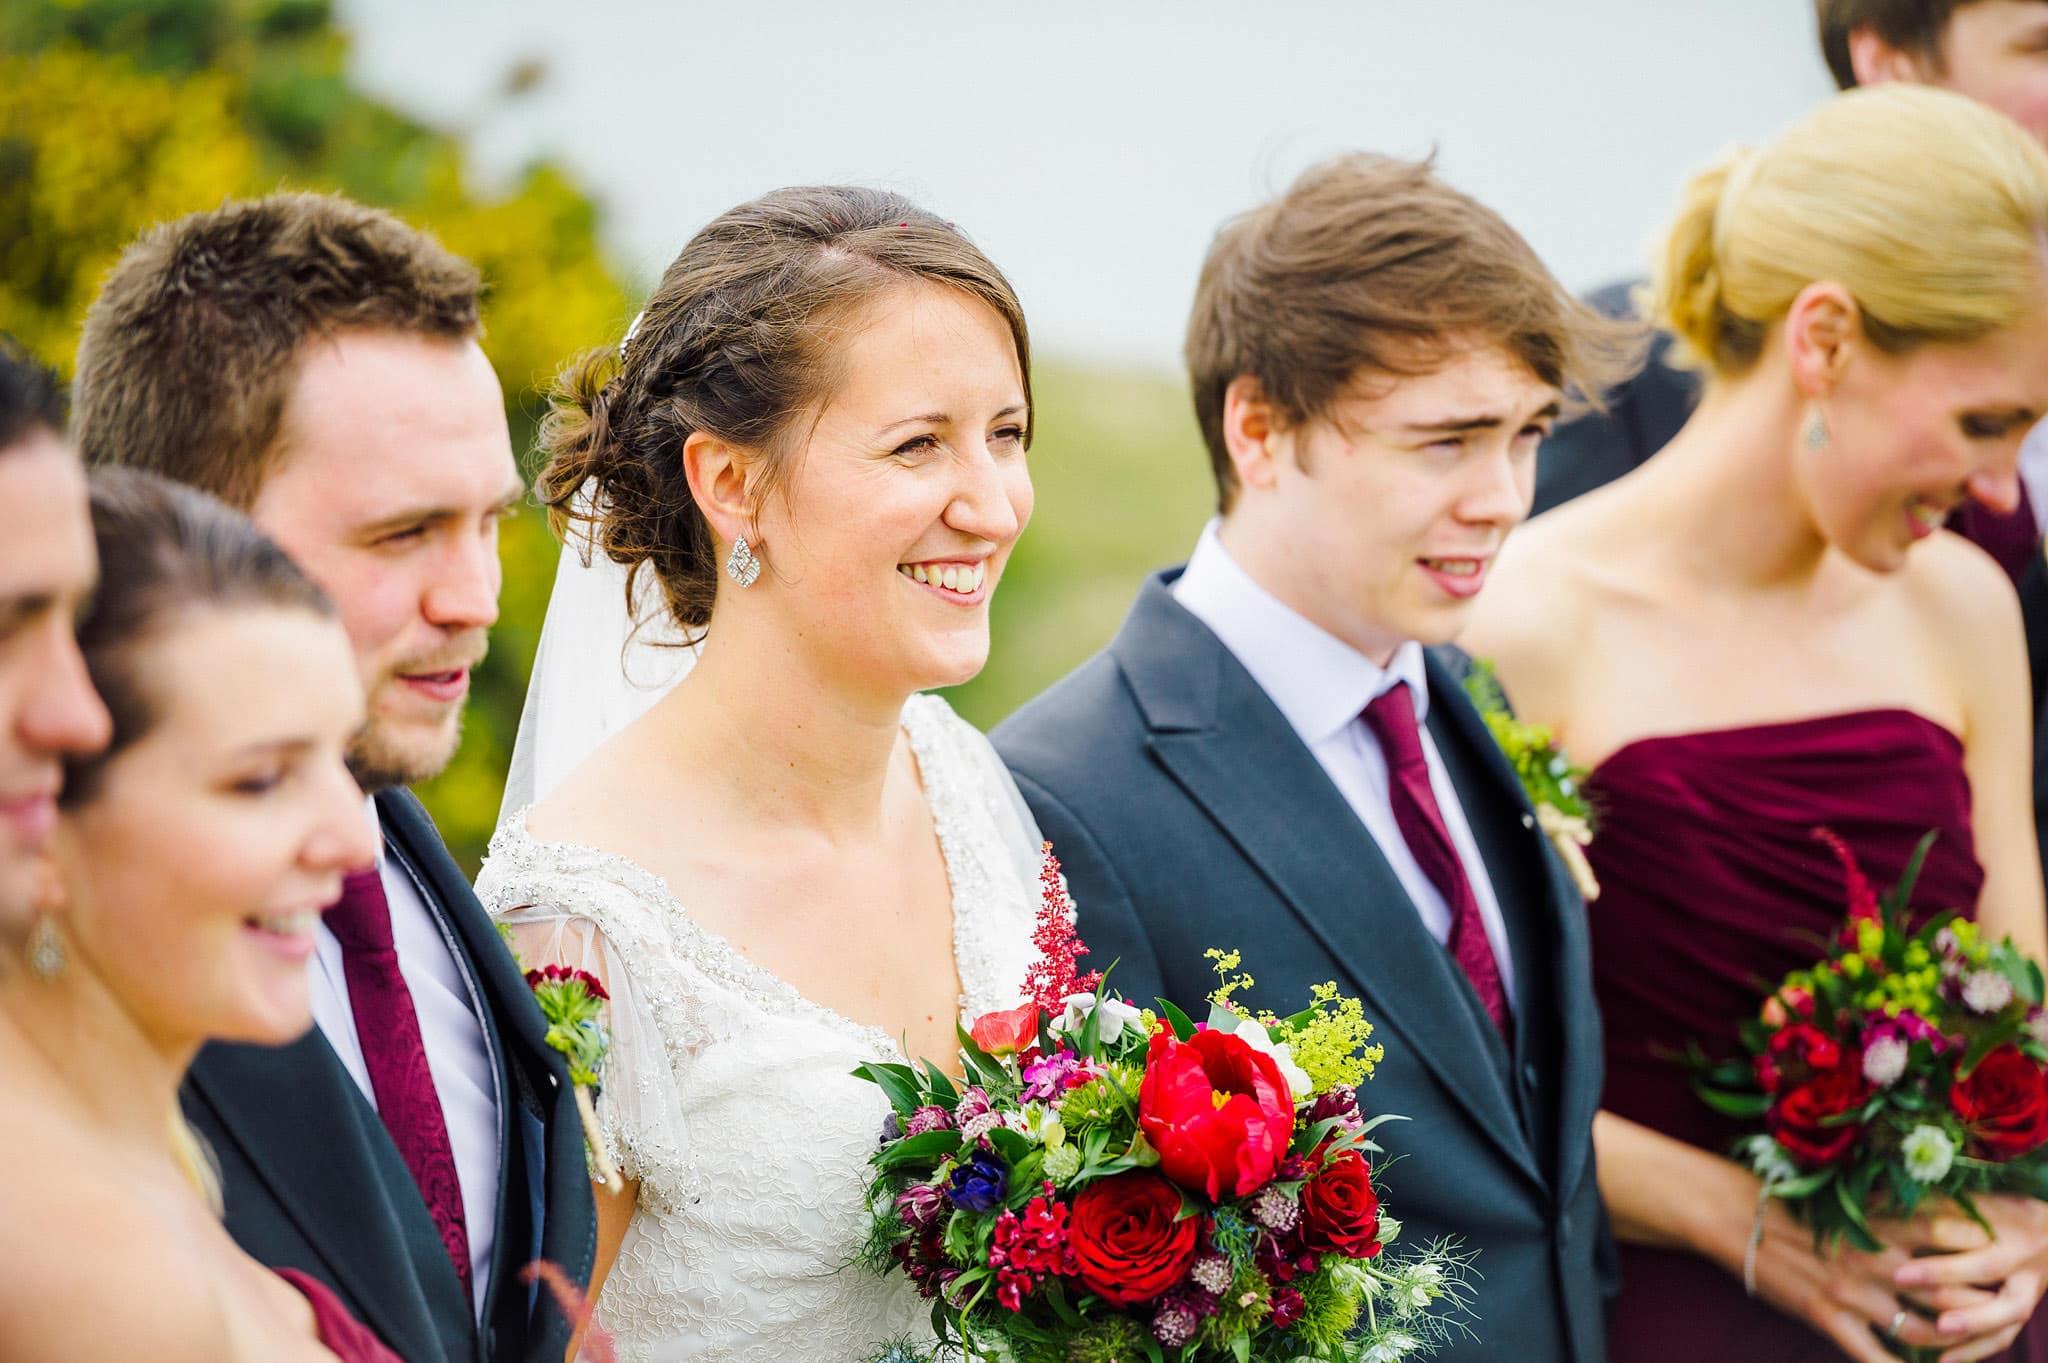 wedding-photographer-aberystwyth-wales (159)